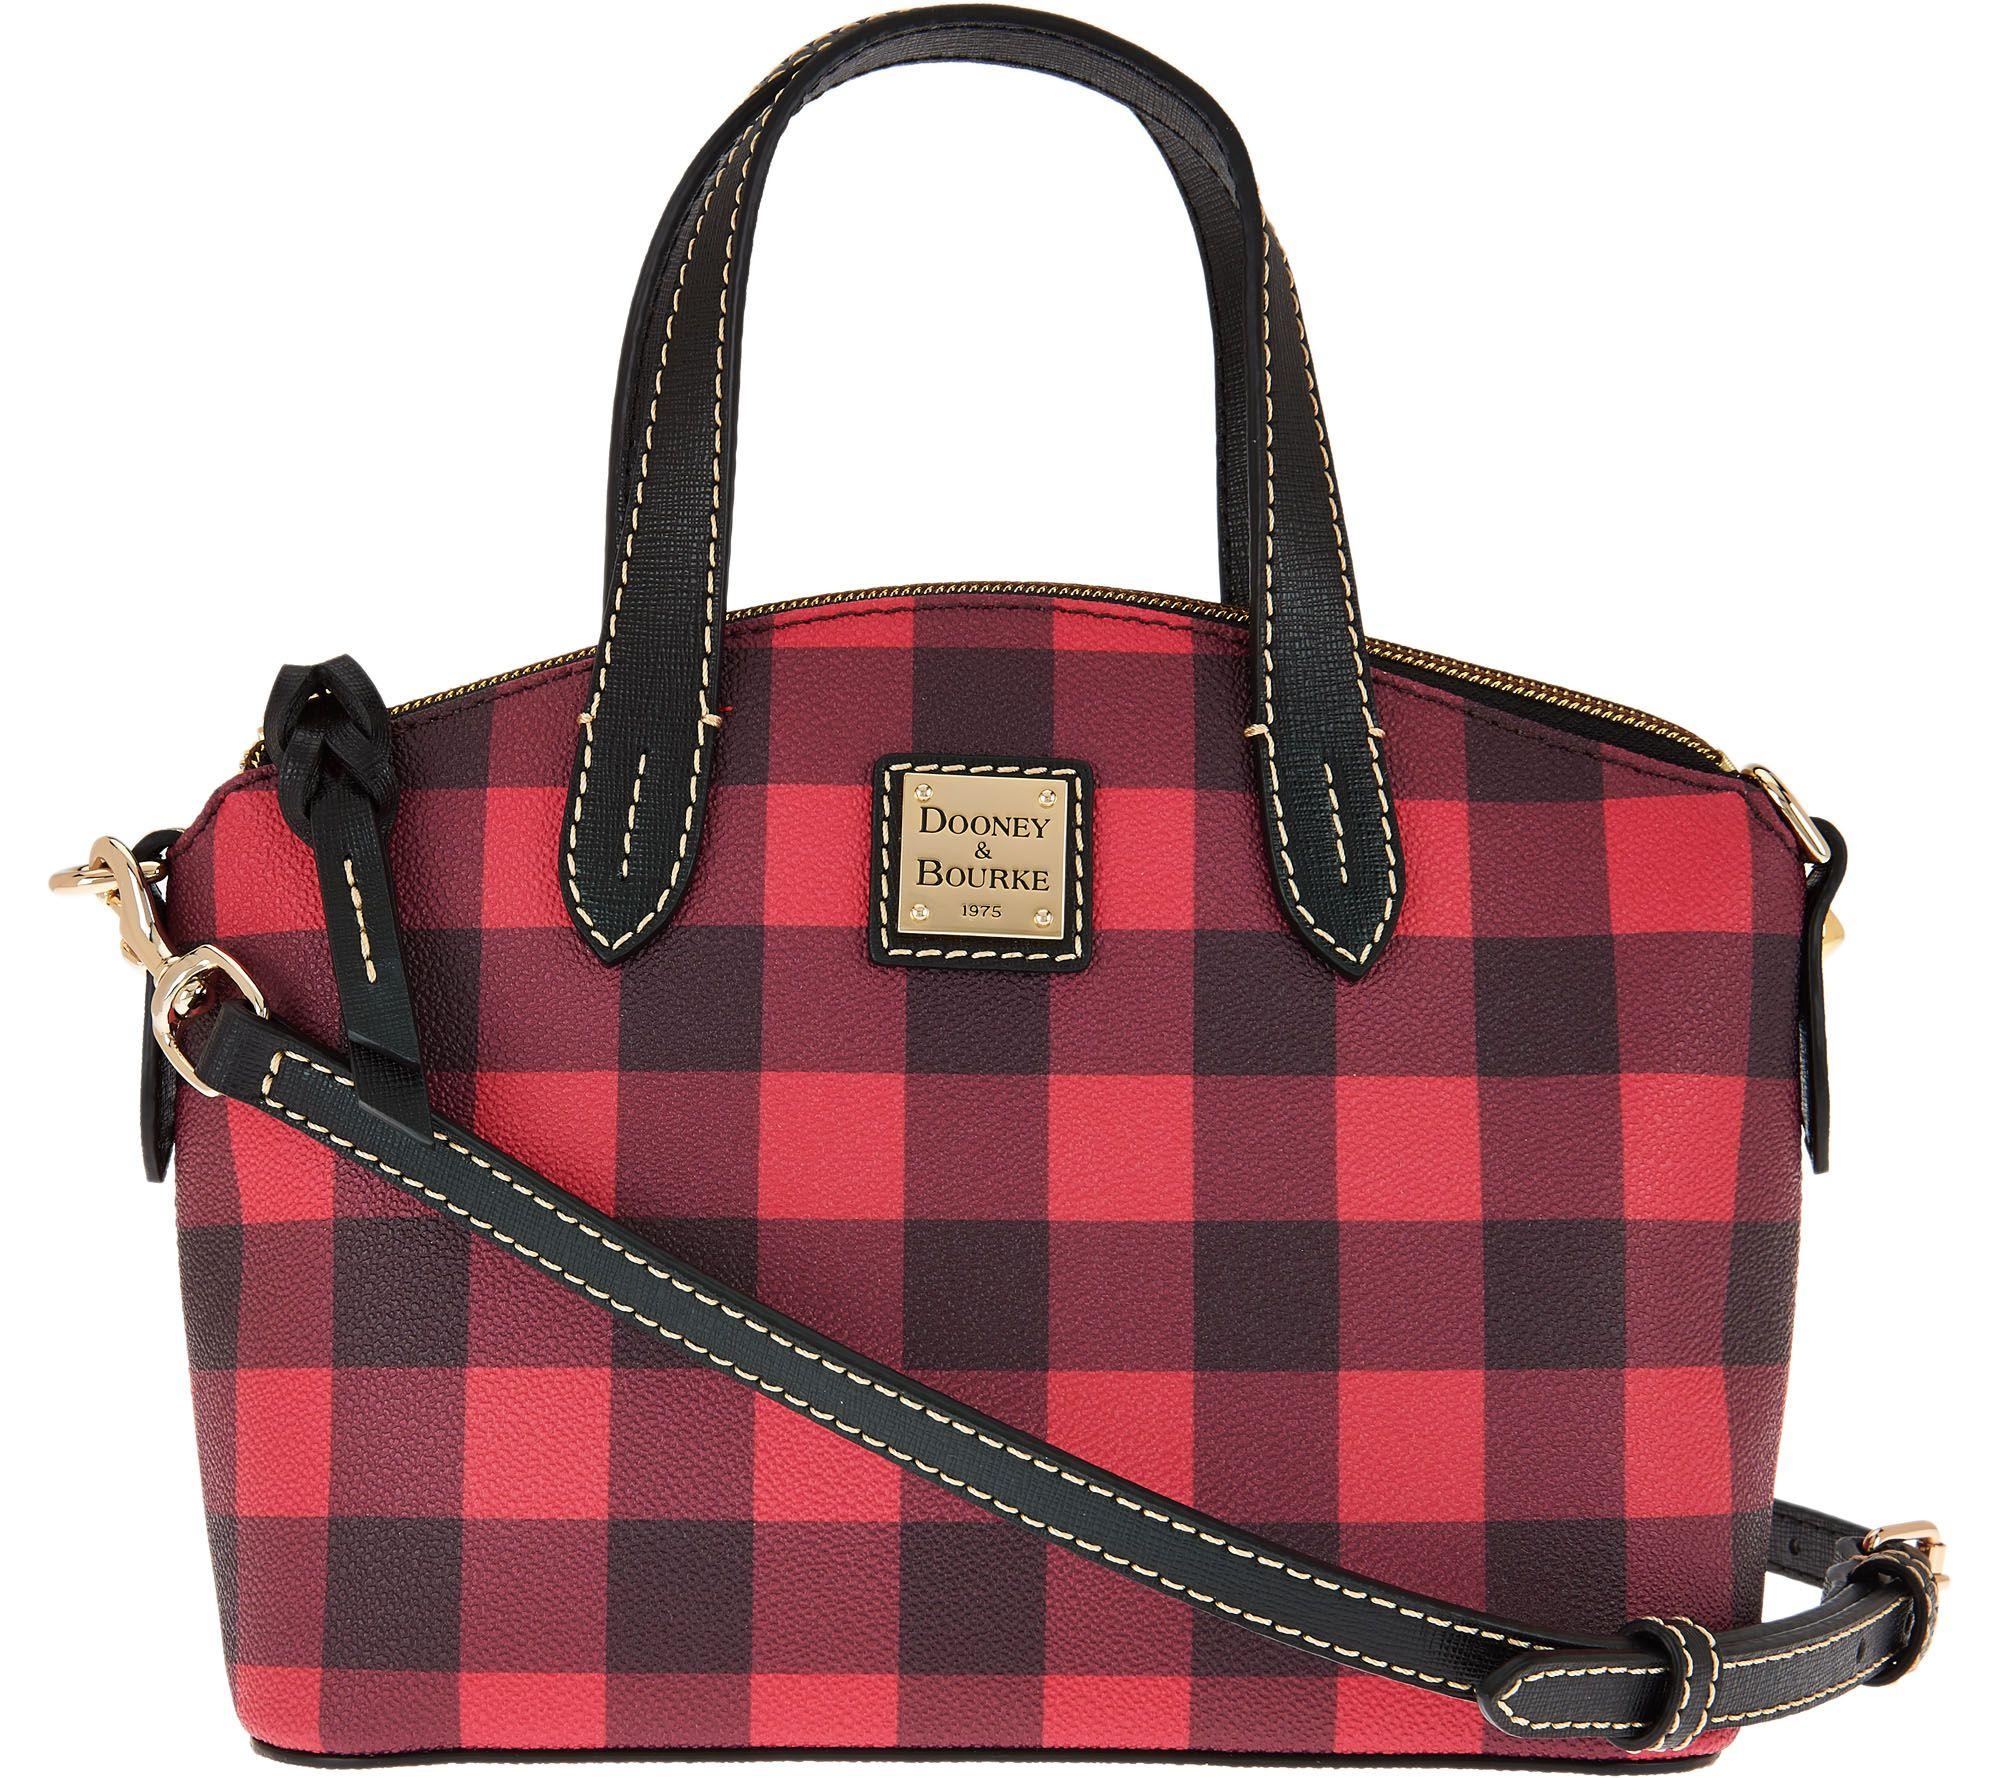 Dooney And Bourke Red Plaid Handbags - HandBags 2018